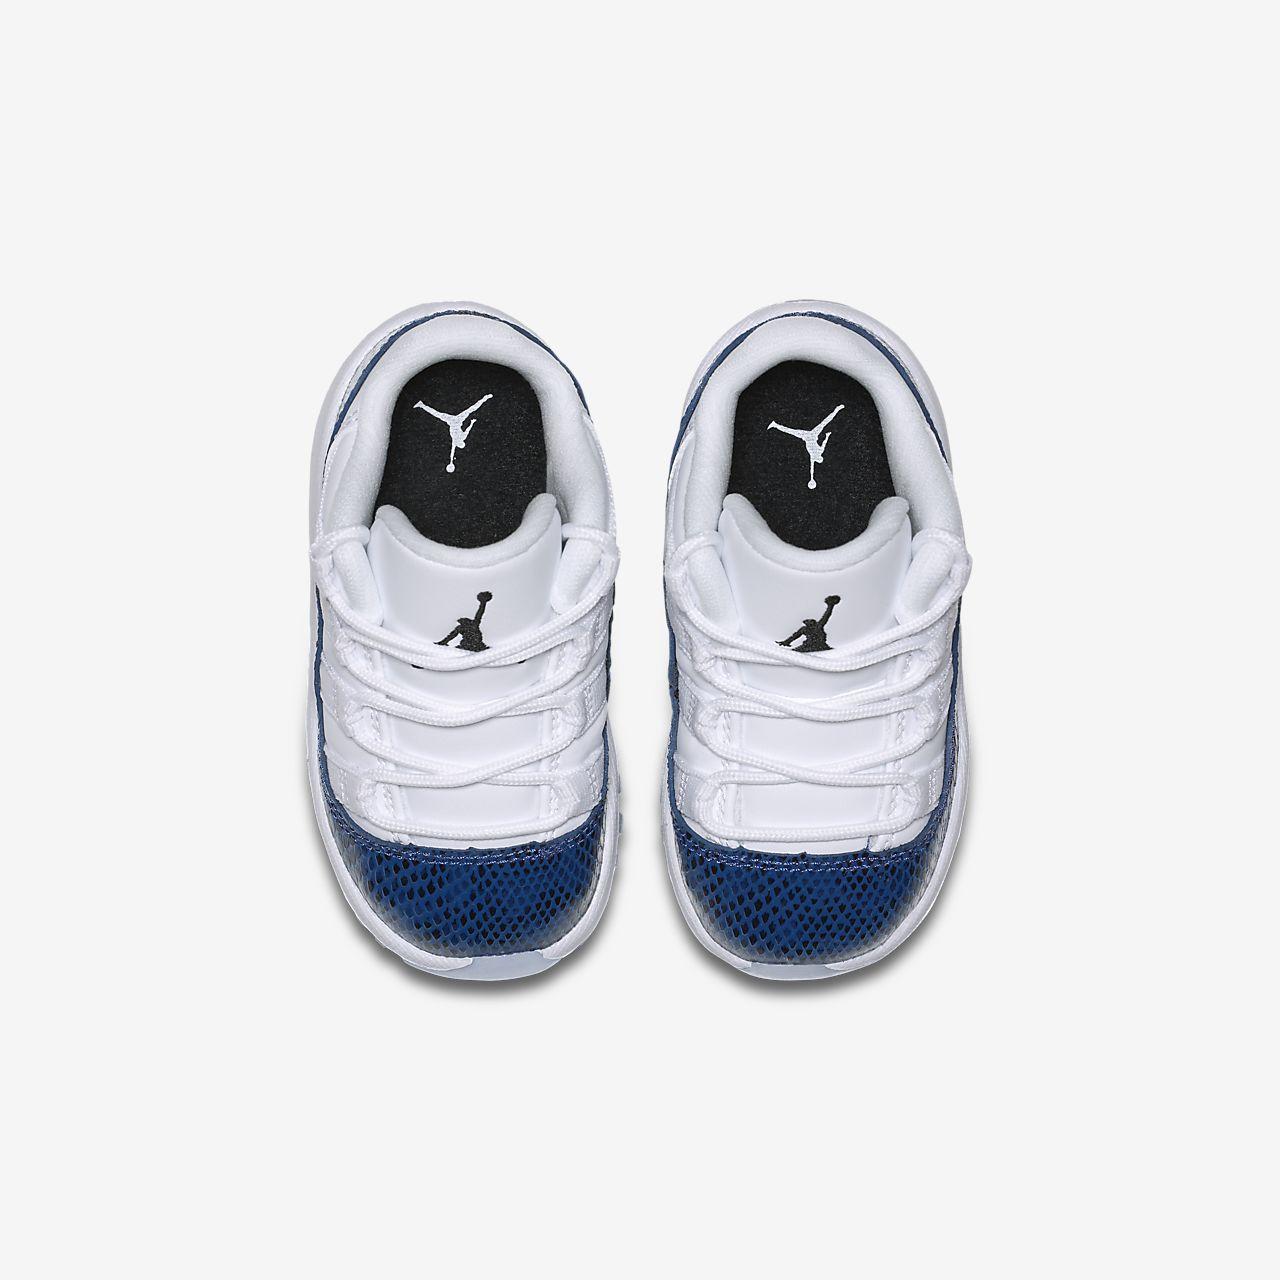 buy popular 2a745 e1151 ... Jordan 11 Retro Low LE Baby Toddler Shoe